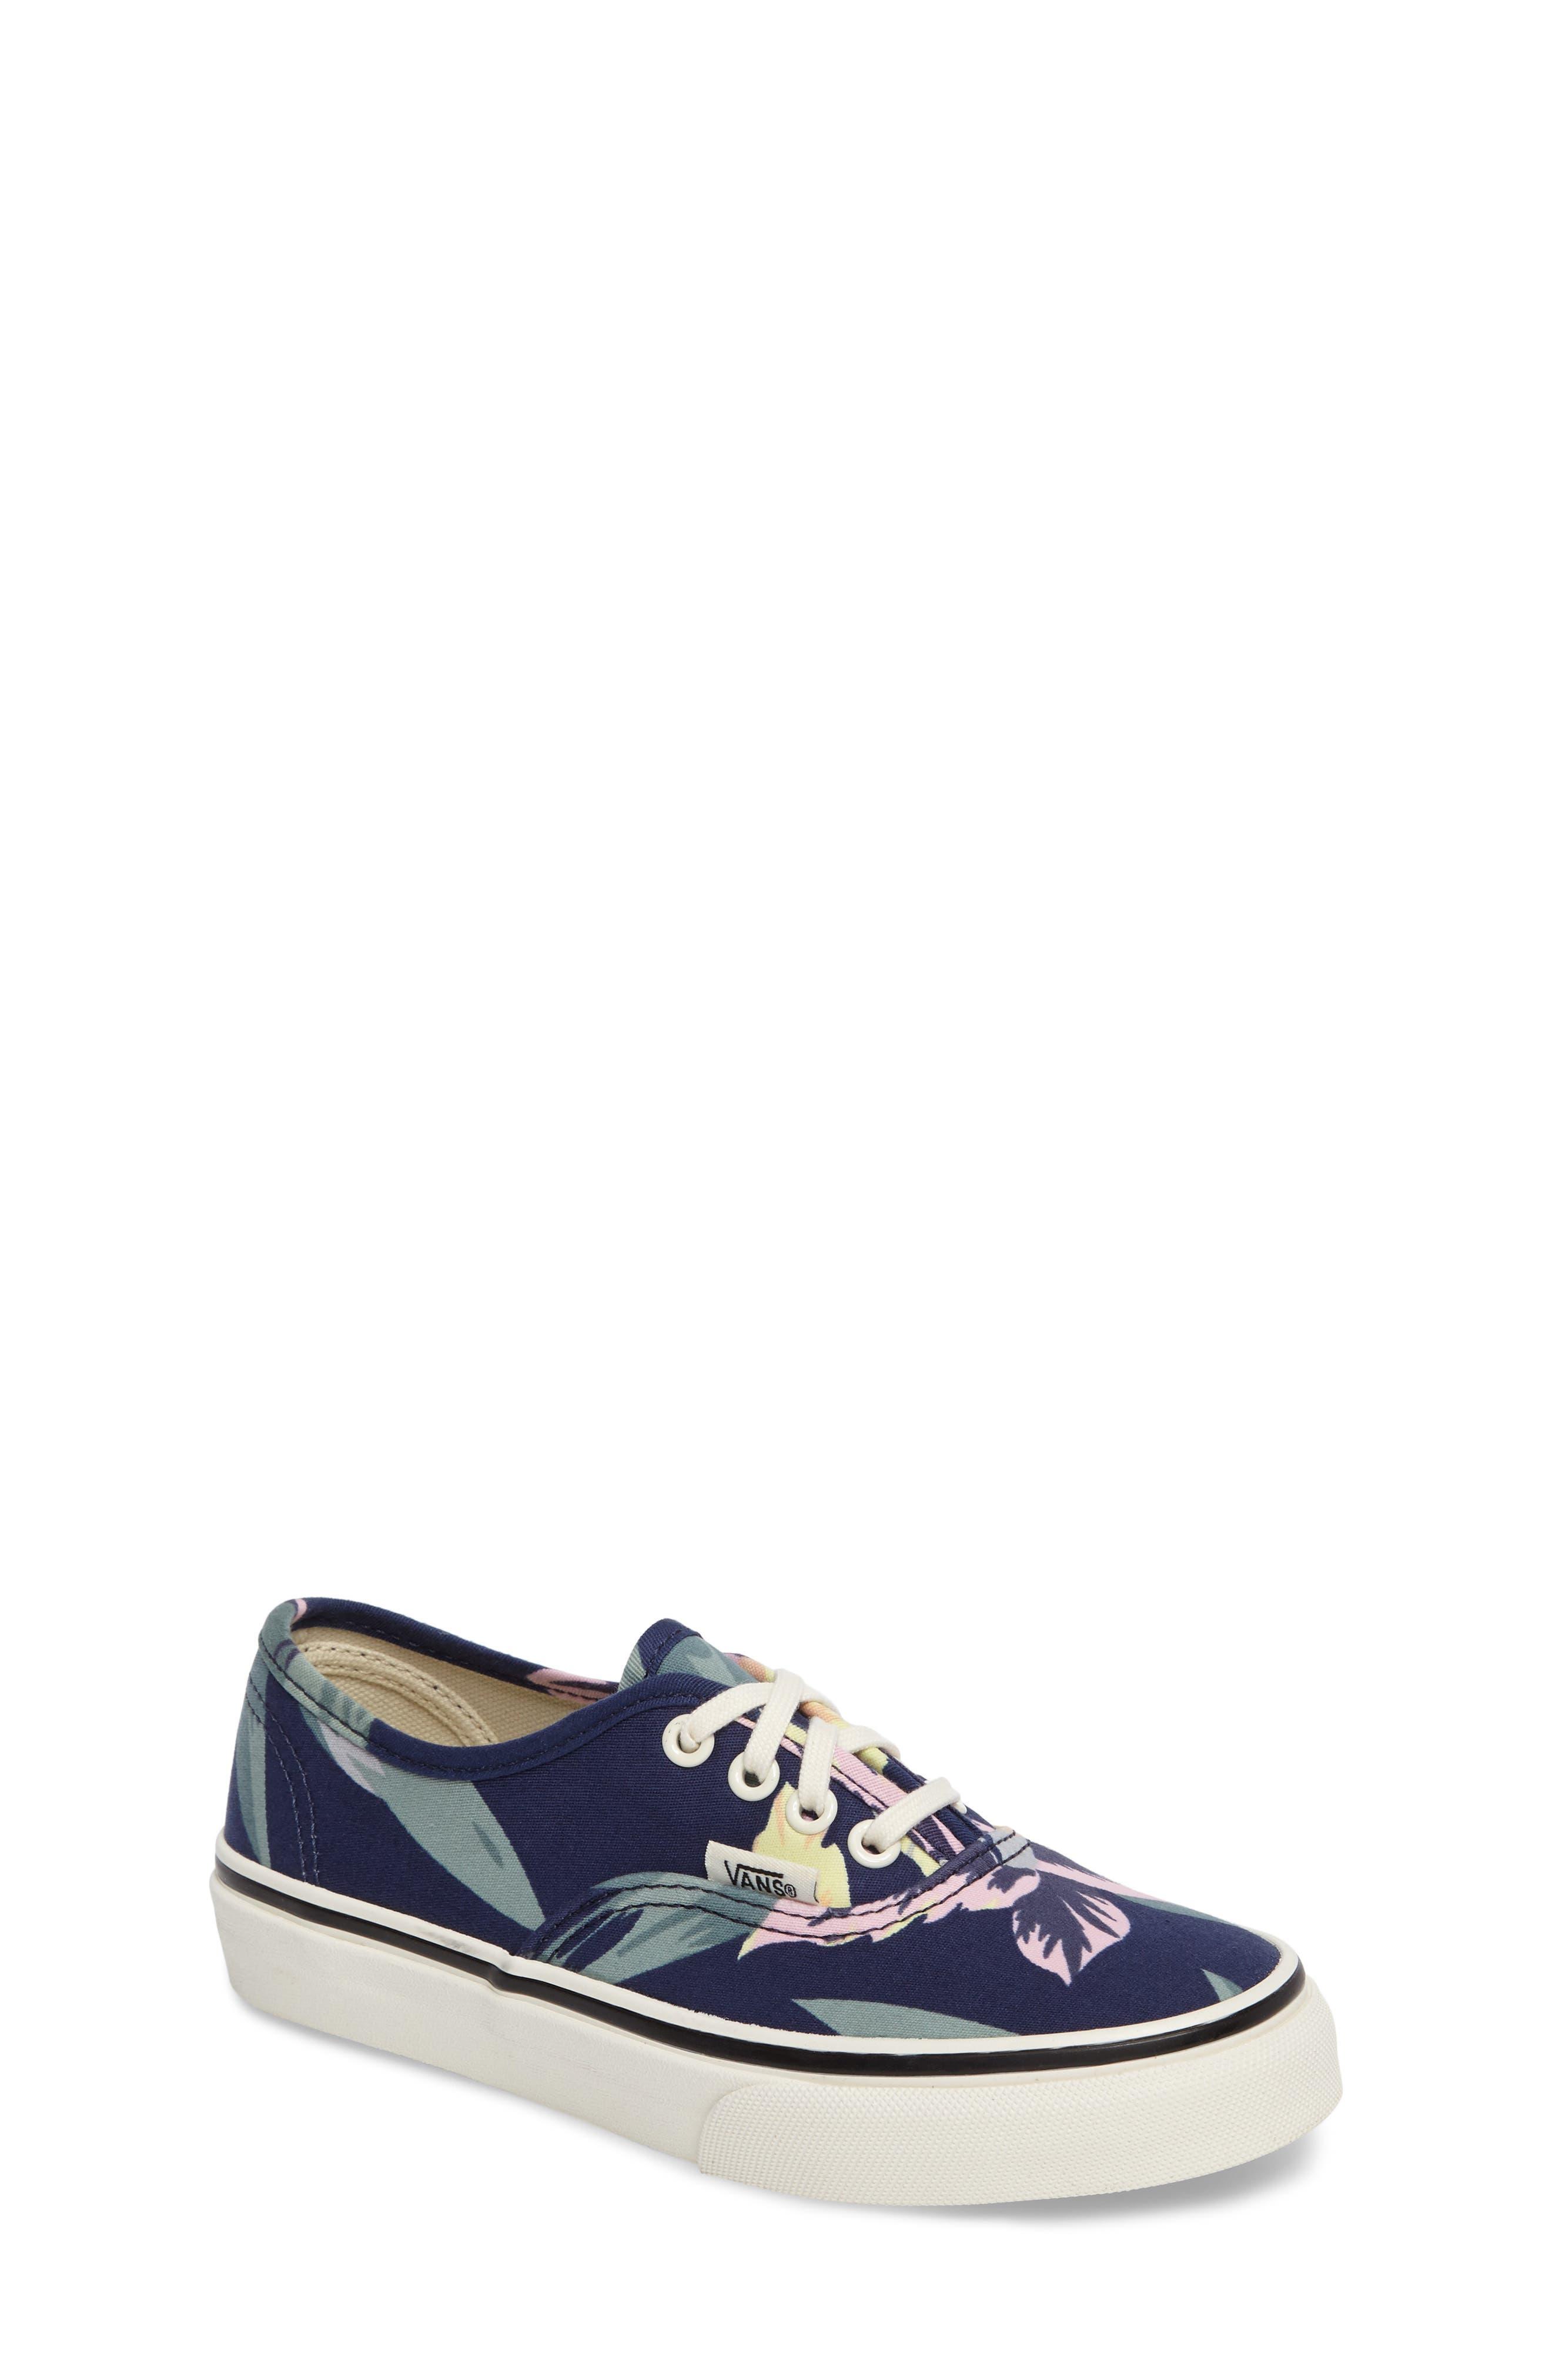 Main Image - Vans Authentic Floral Print Sneaker (Toddler, Little Kid & Big Kid)